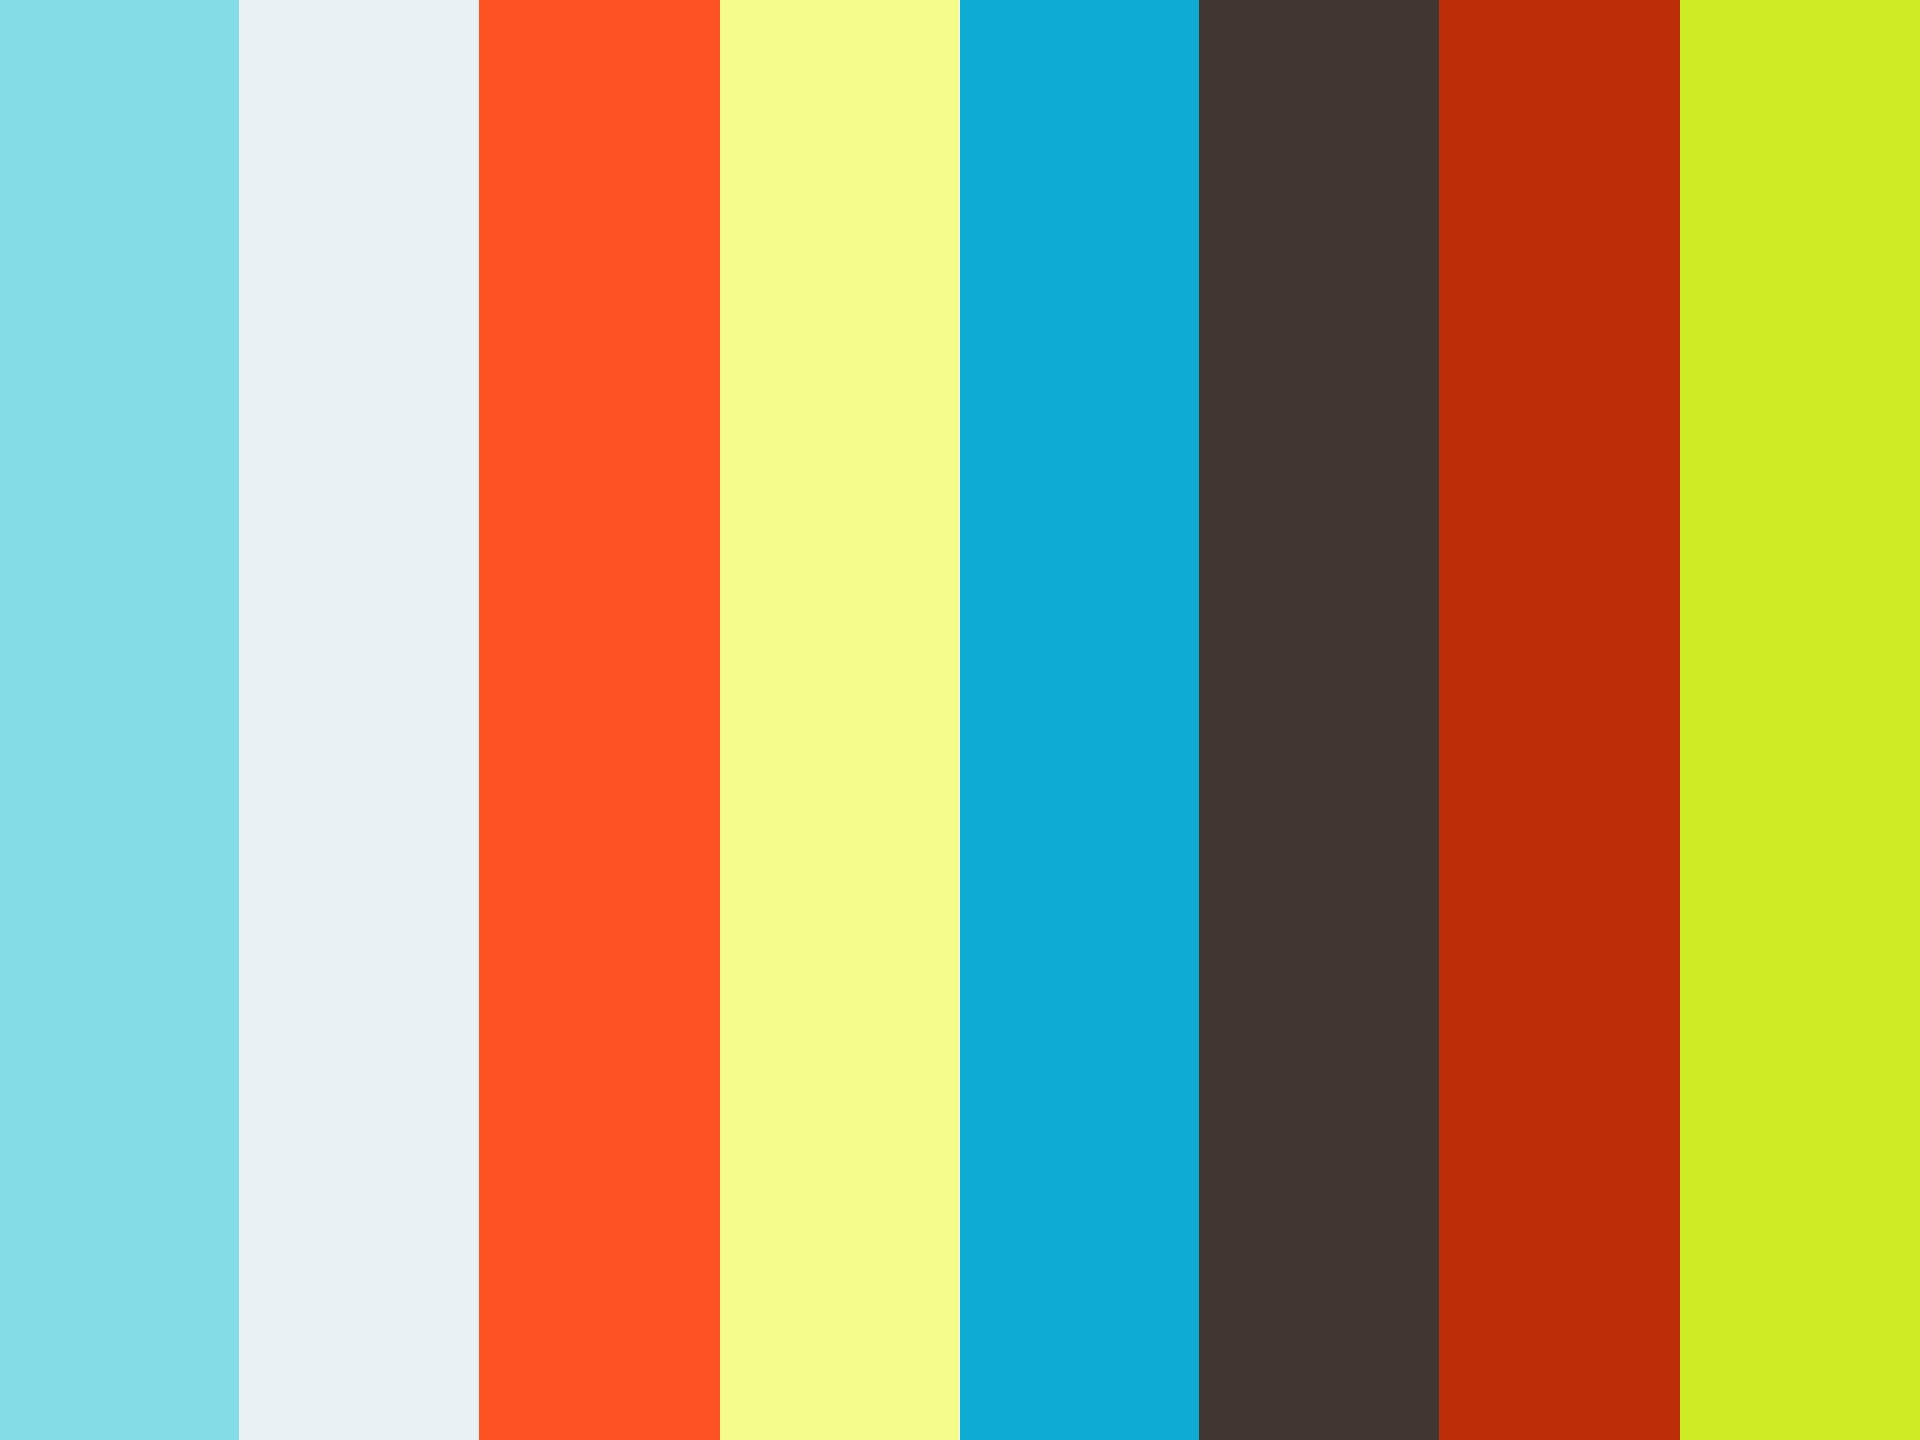 Metro Nissan Of Montclair   Tony   English   224801R2 On Vimeo